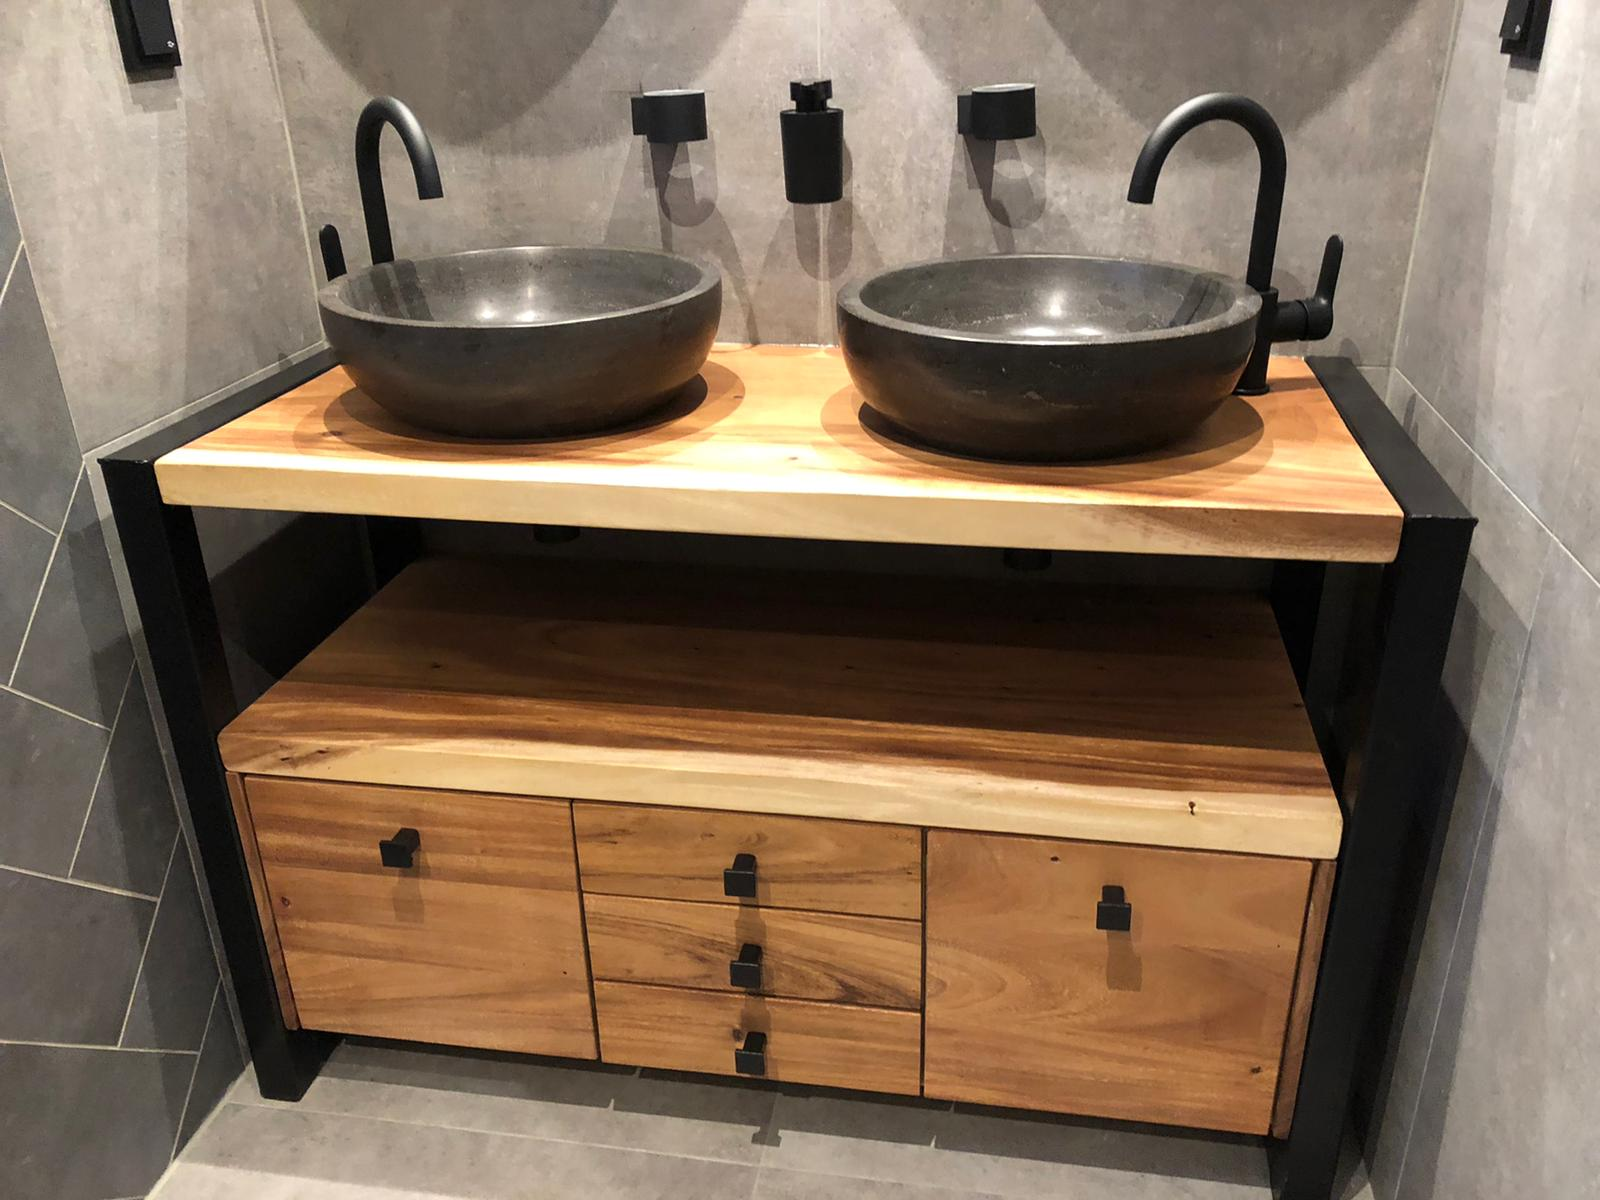 Suar badkamer meubel op maat | Woodindustries